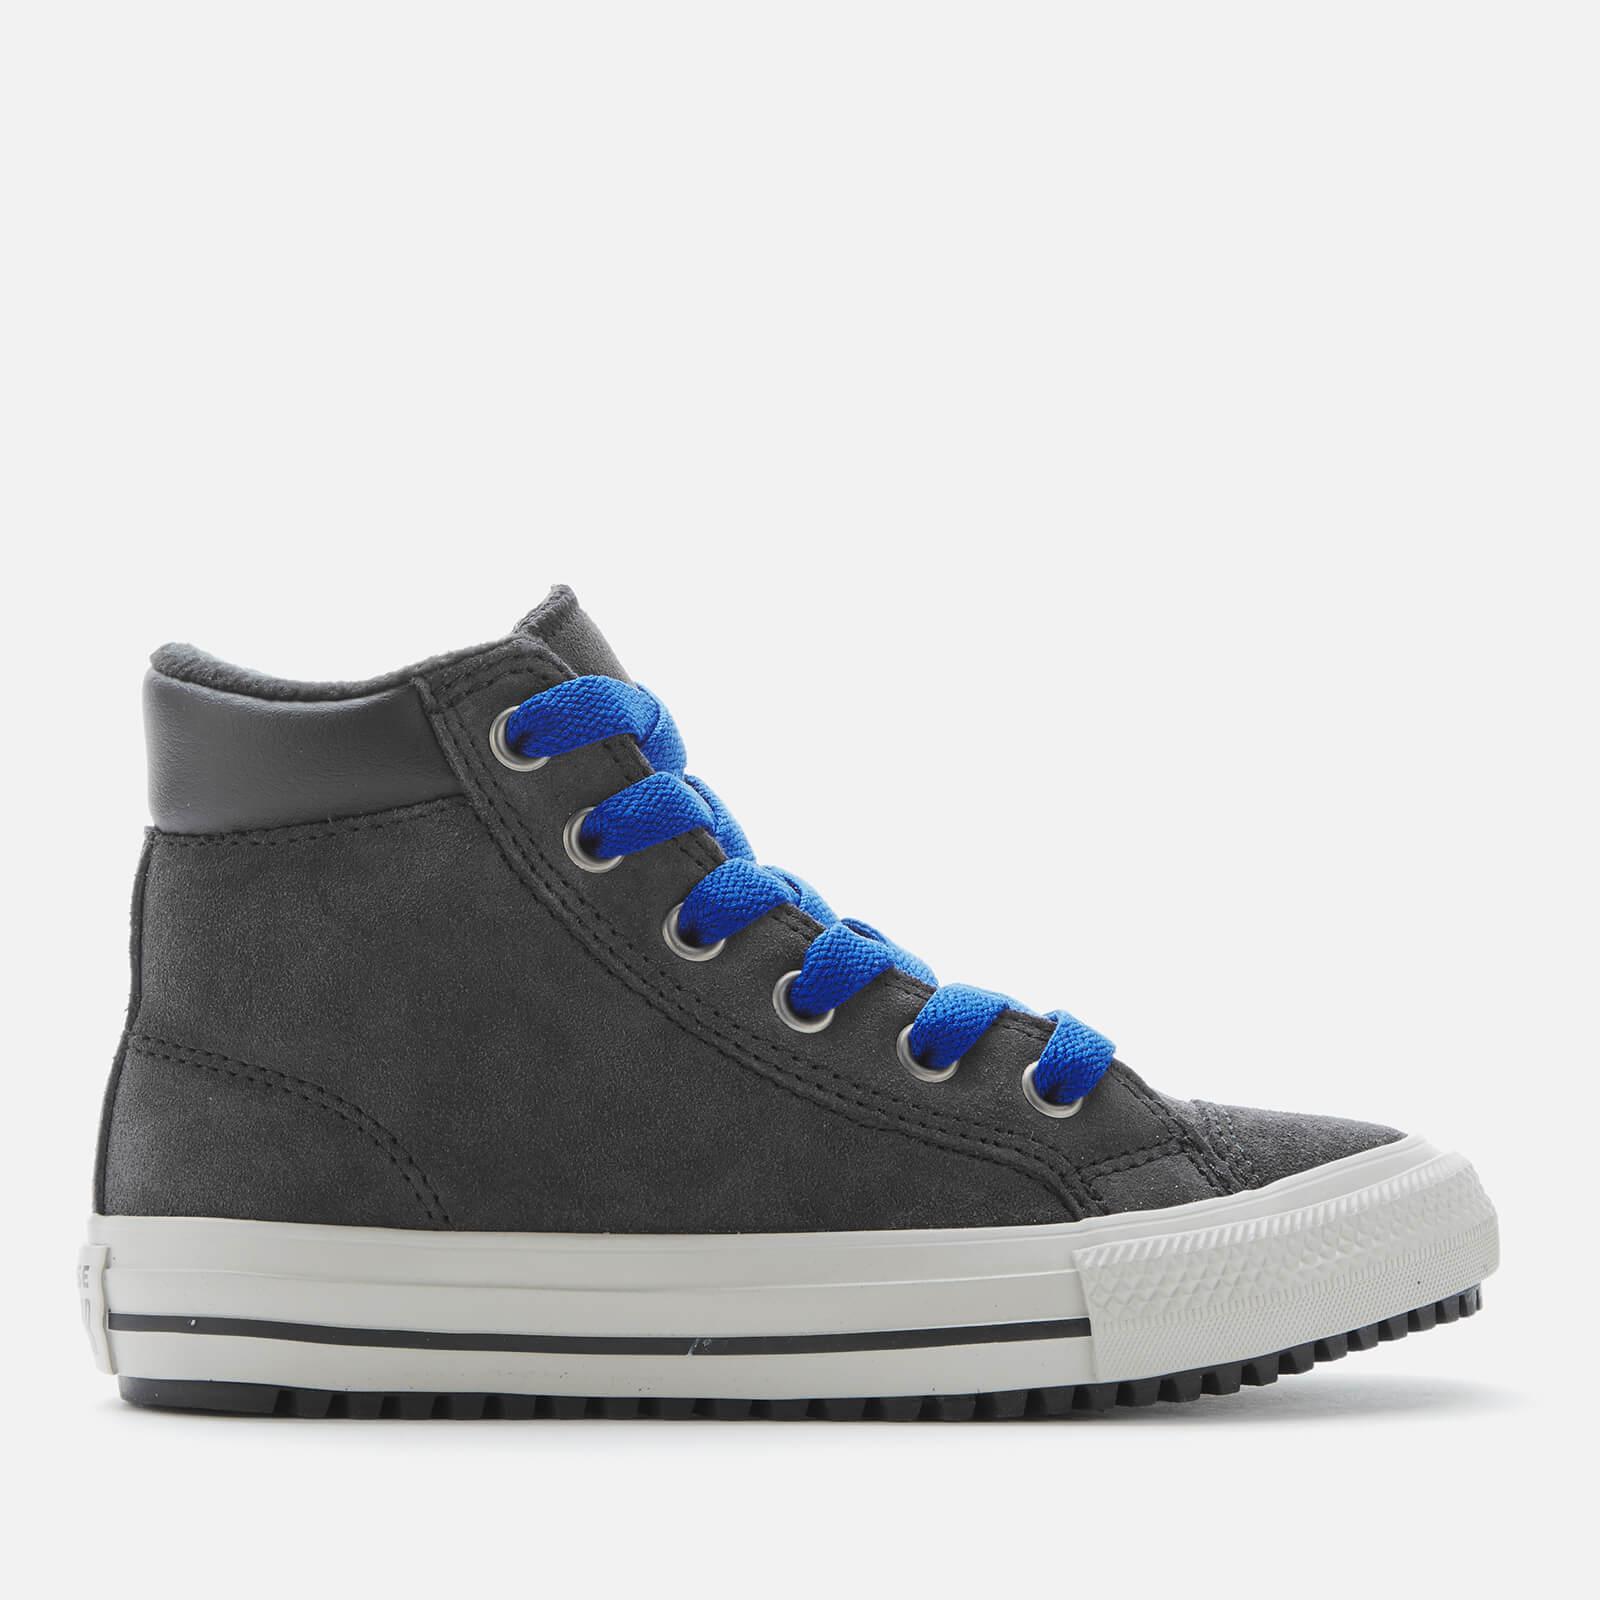 Converse Kids' Chuck Taylor All Star On Mars Pc Boots Almost BlackBlueBirch Bark